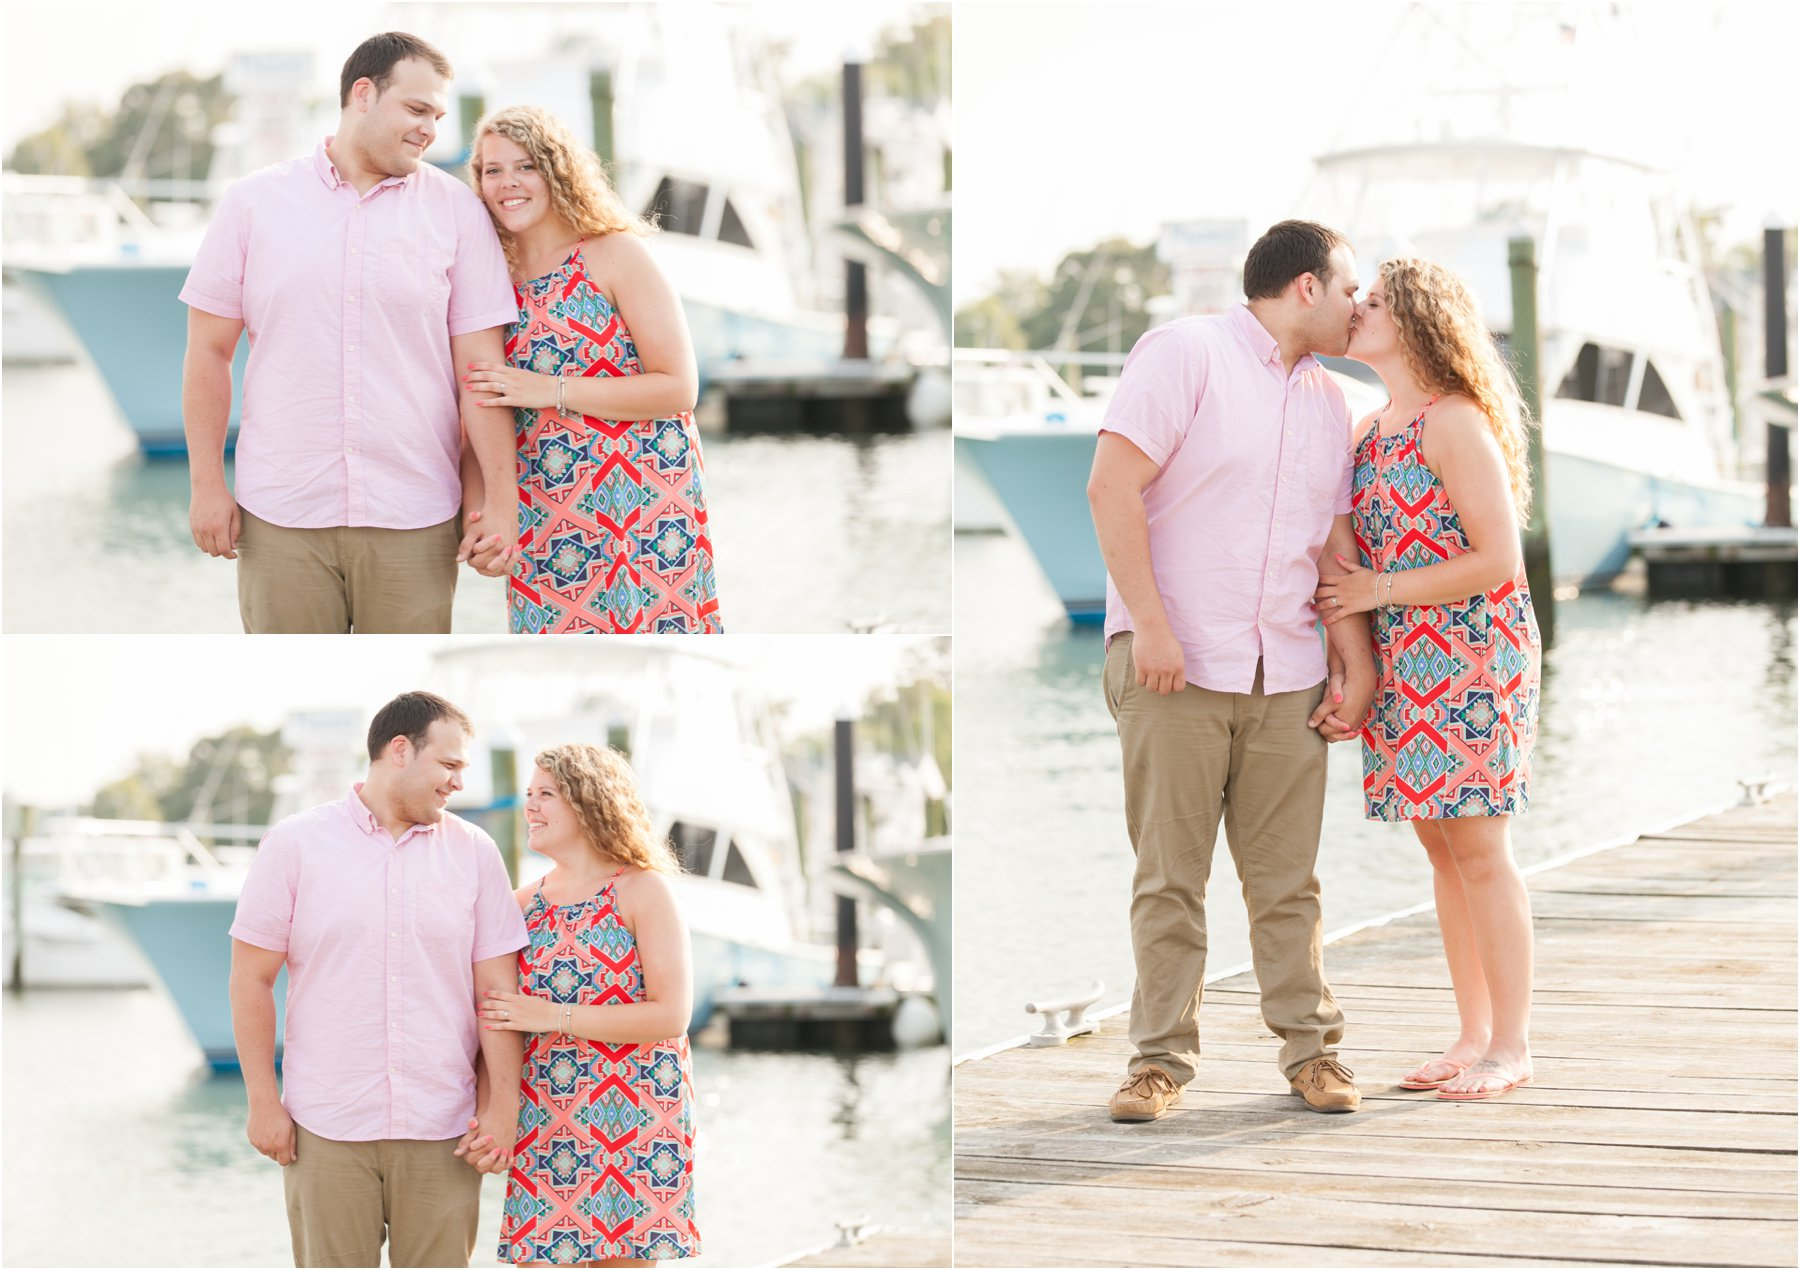 engagement_beach_Photography_Jessica_Ryan_Photography_virginia_virginia_beach_0291